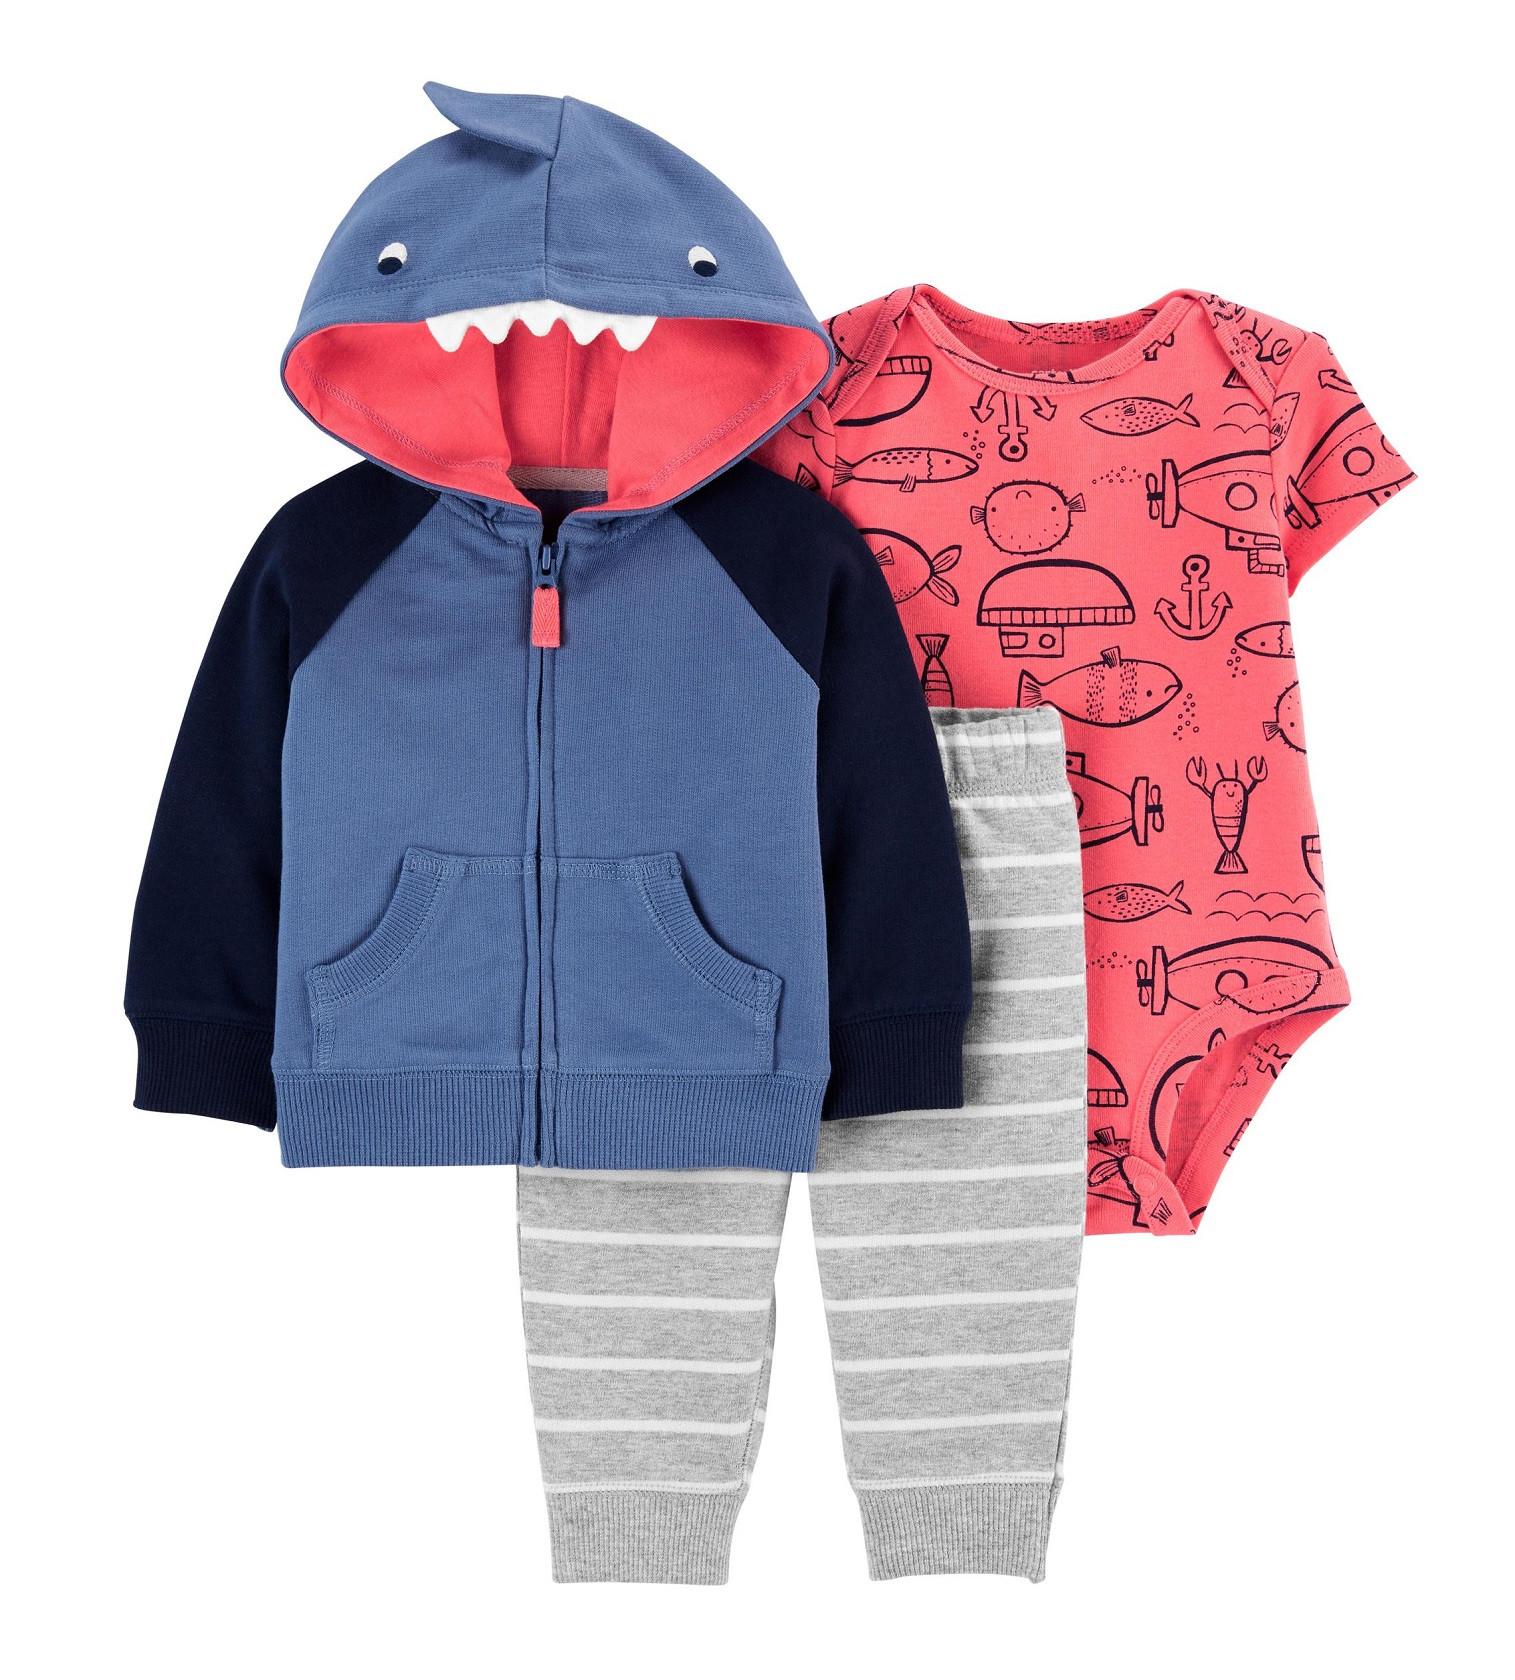 Купити Набір 3в1 Carters Shark Little Jacket Set - фото 1